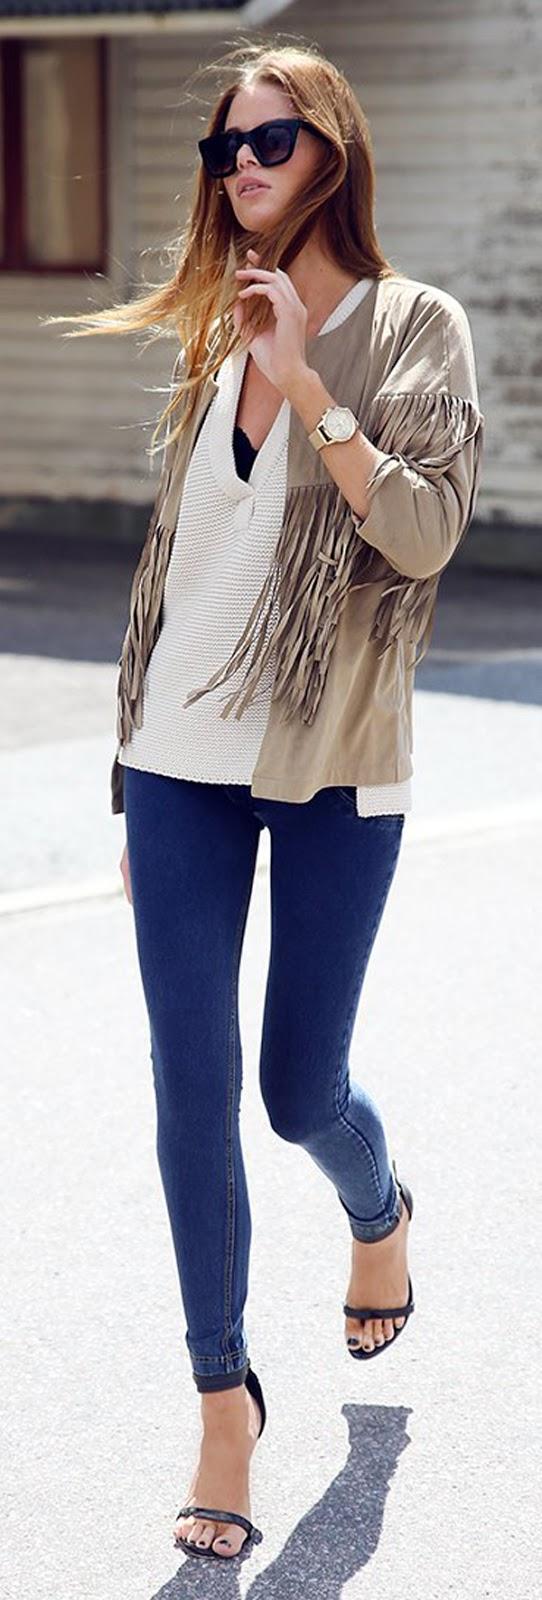 skinny jeans + tank top